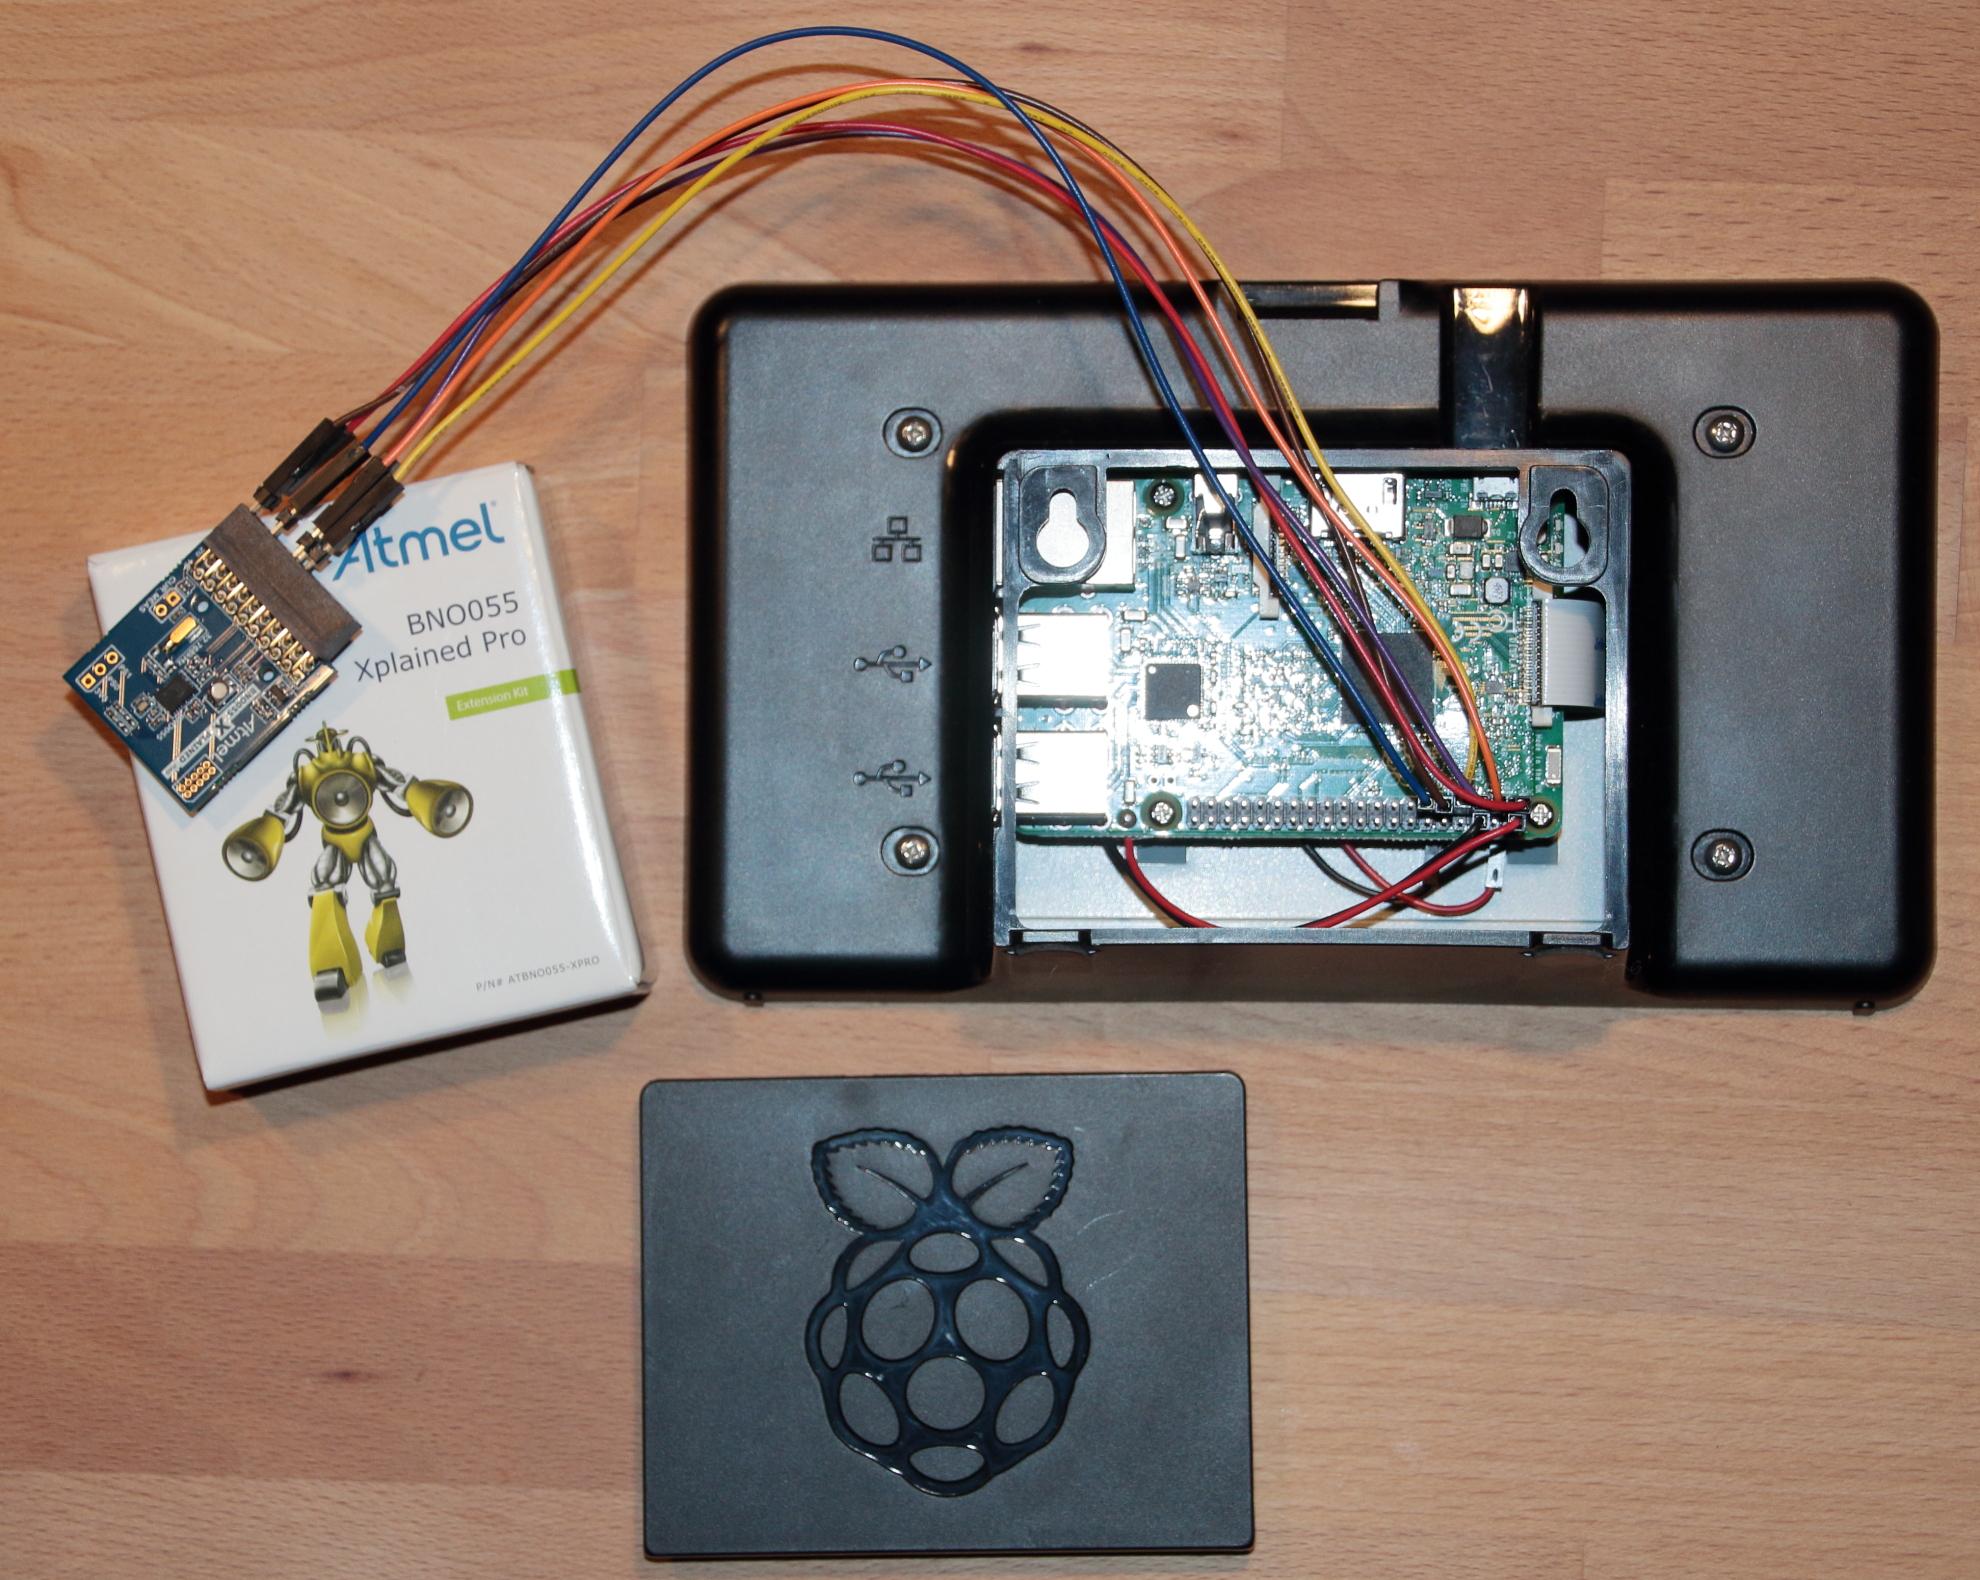 Motion Sensor PoC: BNO055 and Raspberry Pi Subtleties – Hauke's Projects